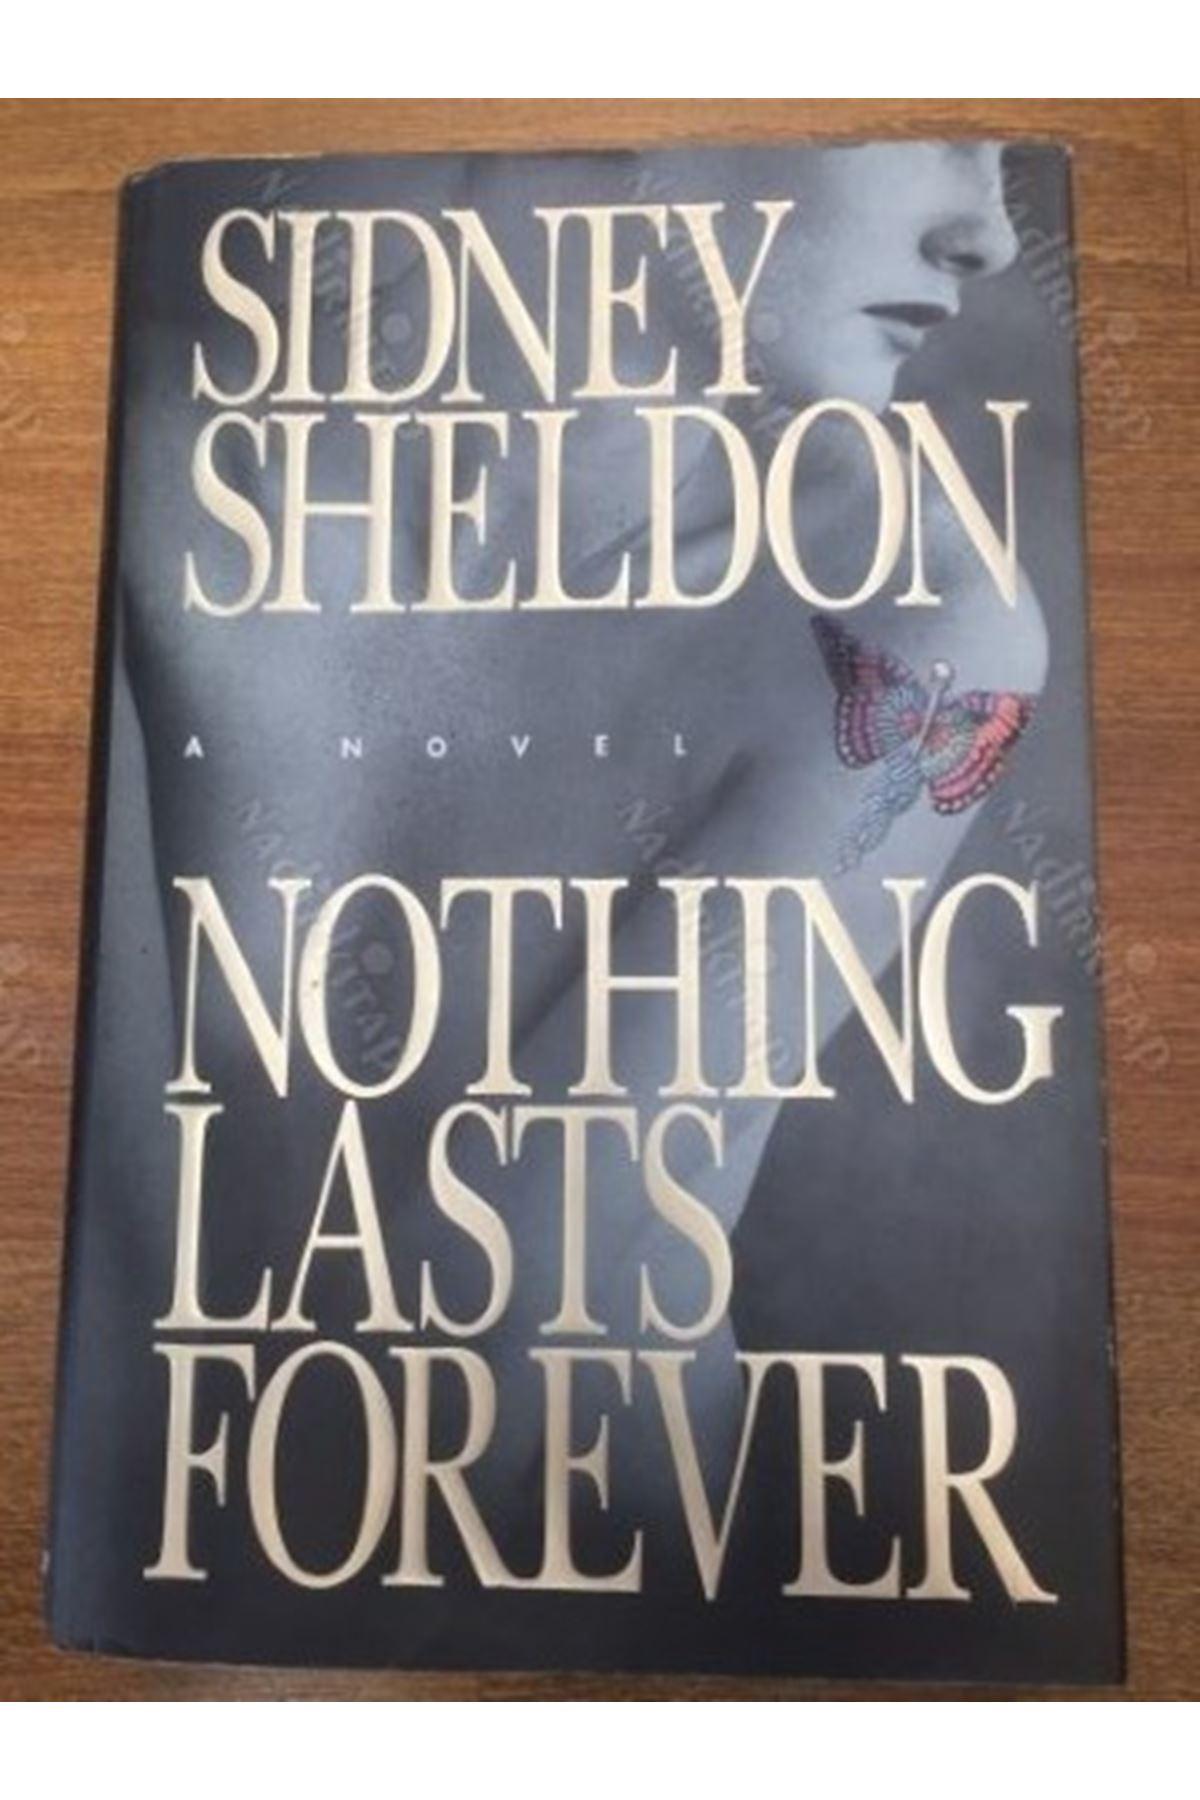 SİDNEY SHELDON - NOTHİNG LASTS FOREVER